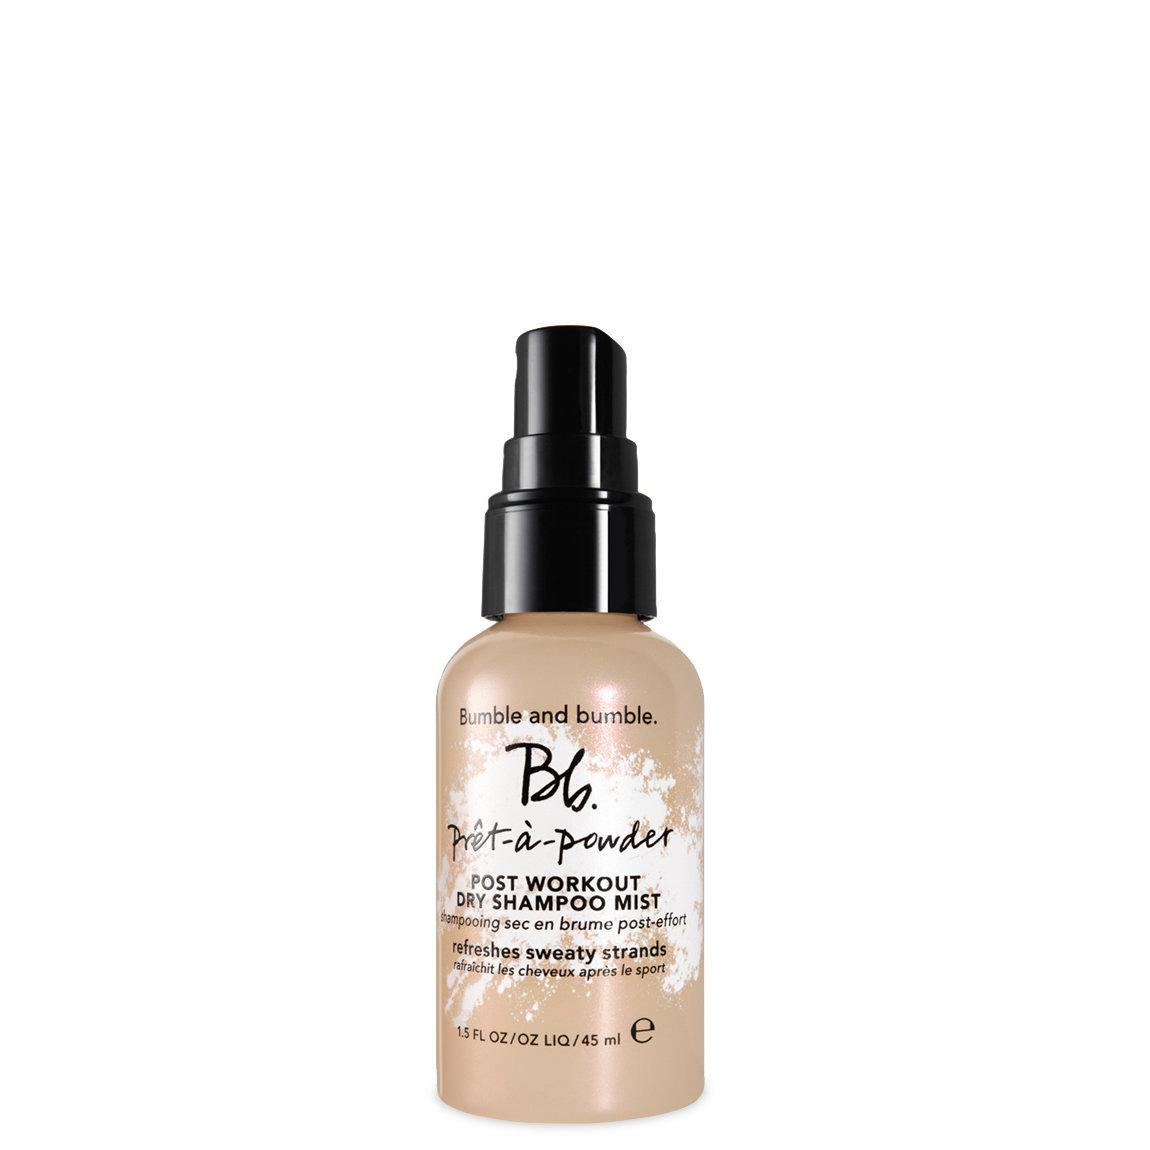 Bumble and bumble. Prêt-à-Powder Post Workout Dry Shampoo Mist 1.5 fl oz product swatch.